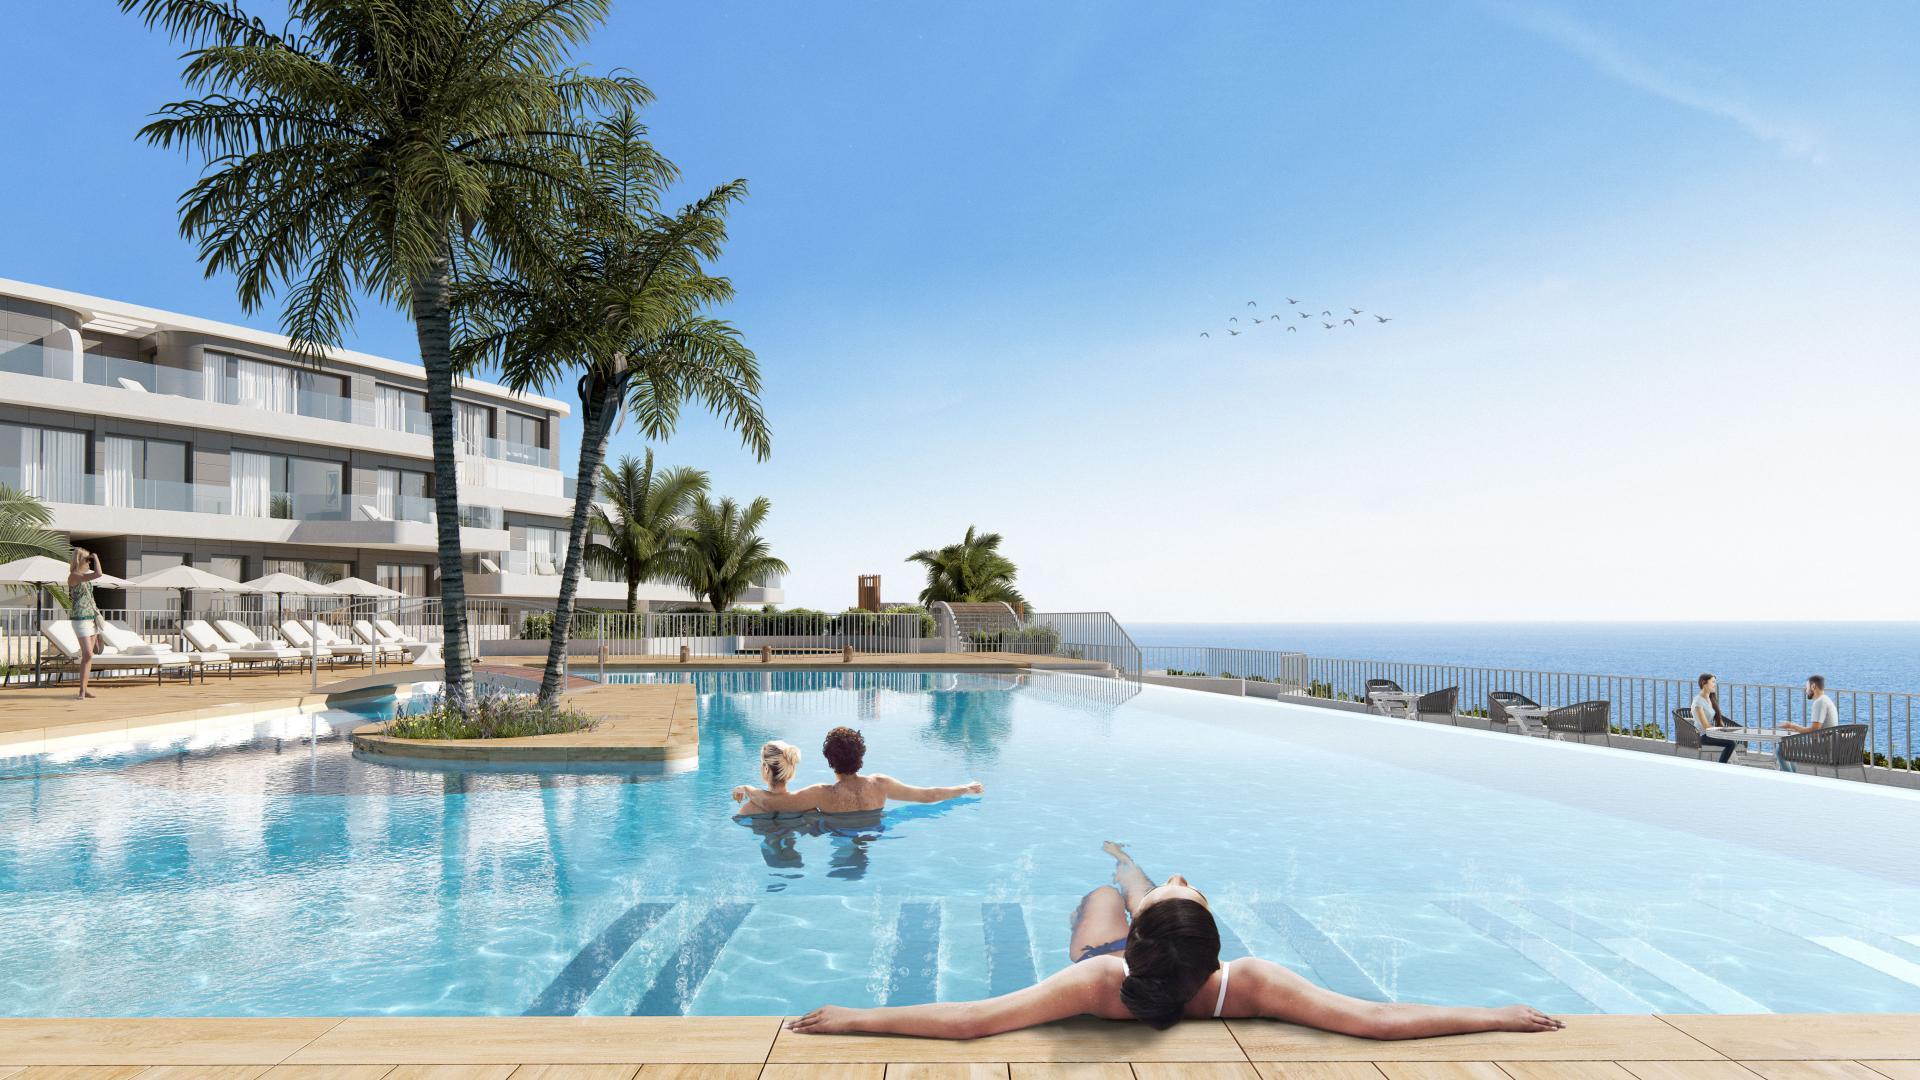 2 Bedroom Apartment in Aguilas, Costa Cálida in Medvilla Spanje